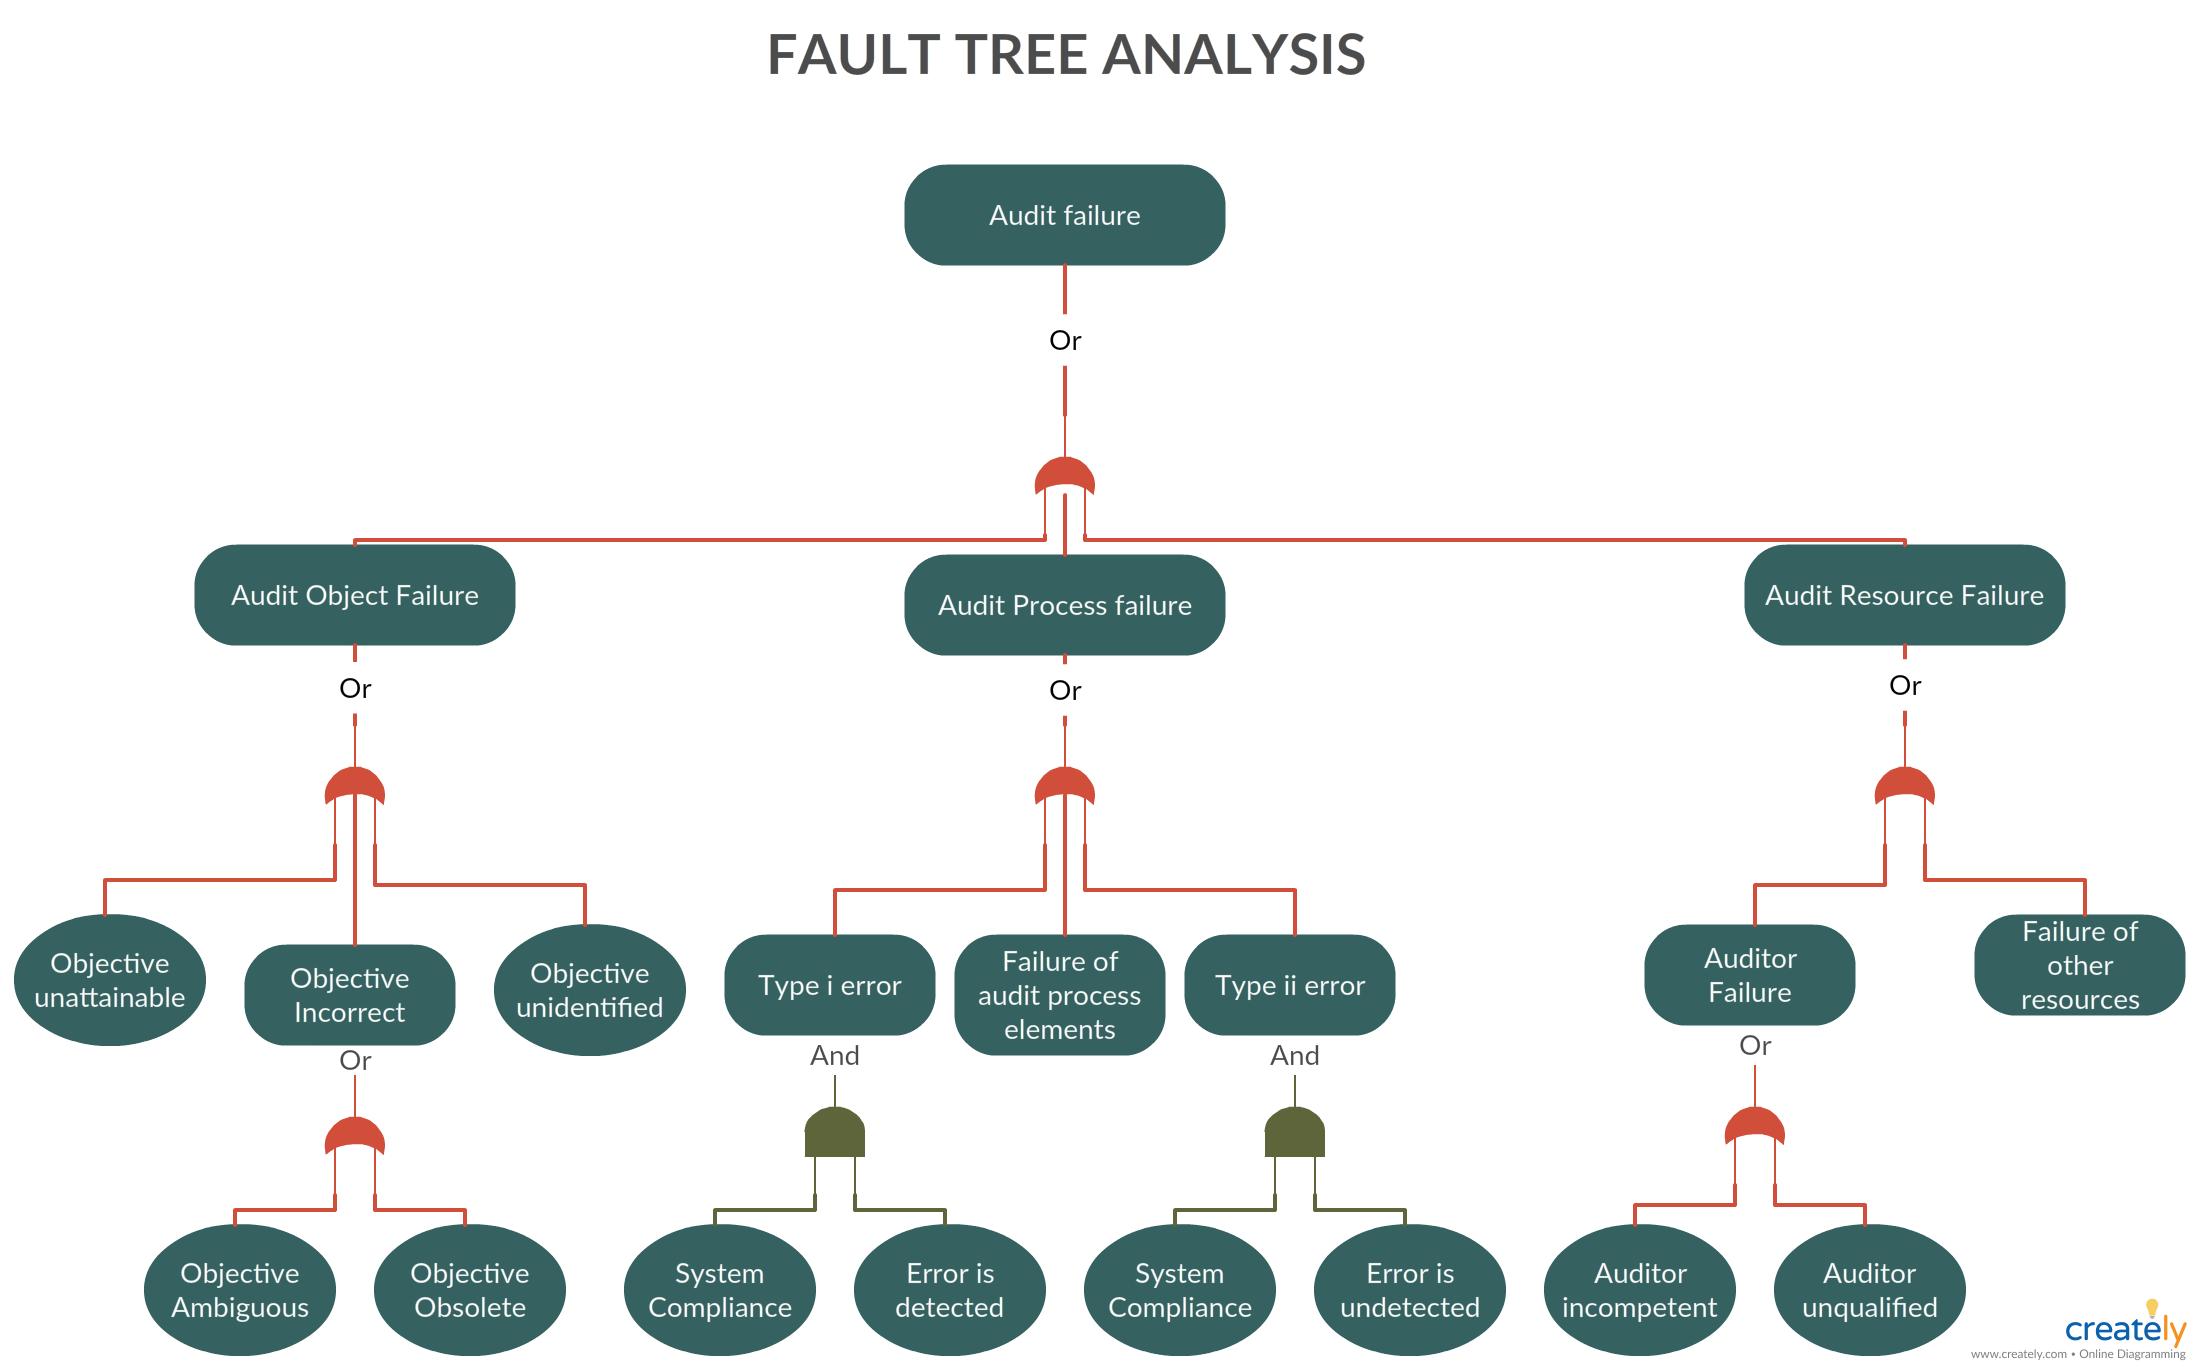 Fault Tree Analysis Diagram | Analysis, Process flow diagram, Blank  calendar template | Logic Tree Diagram |  | Pinterest